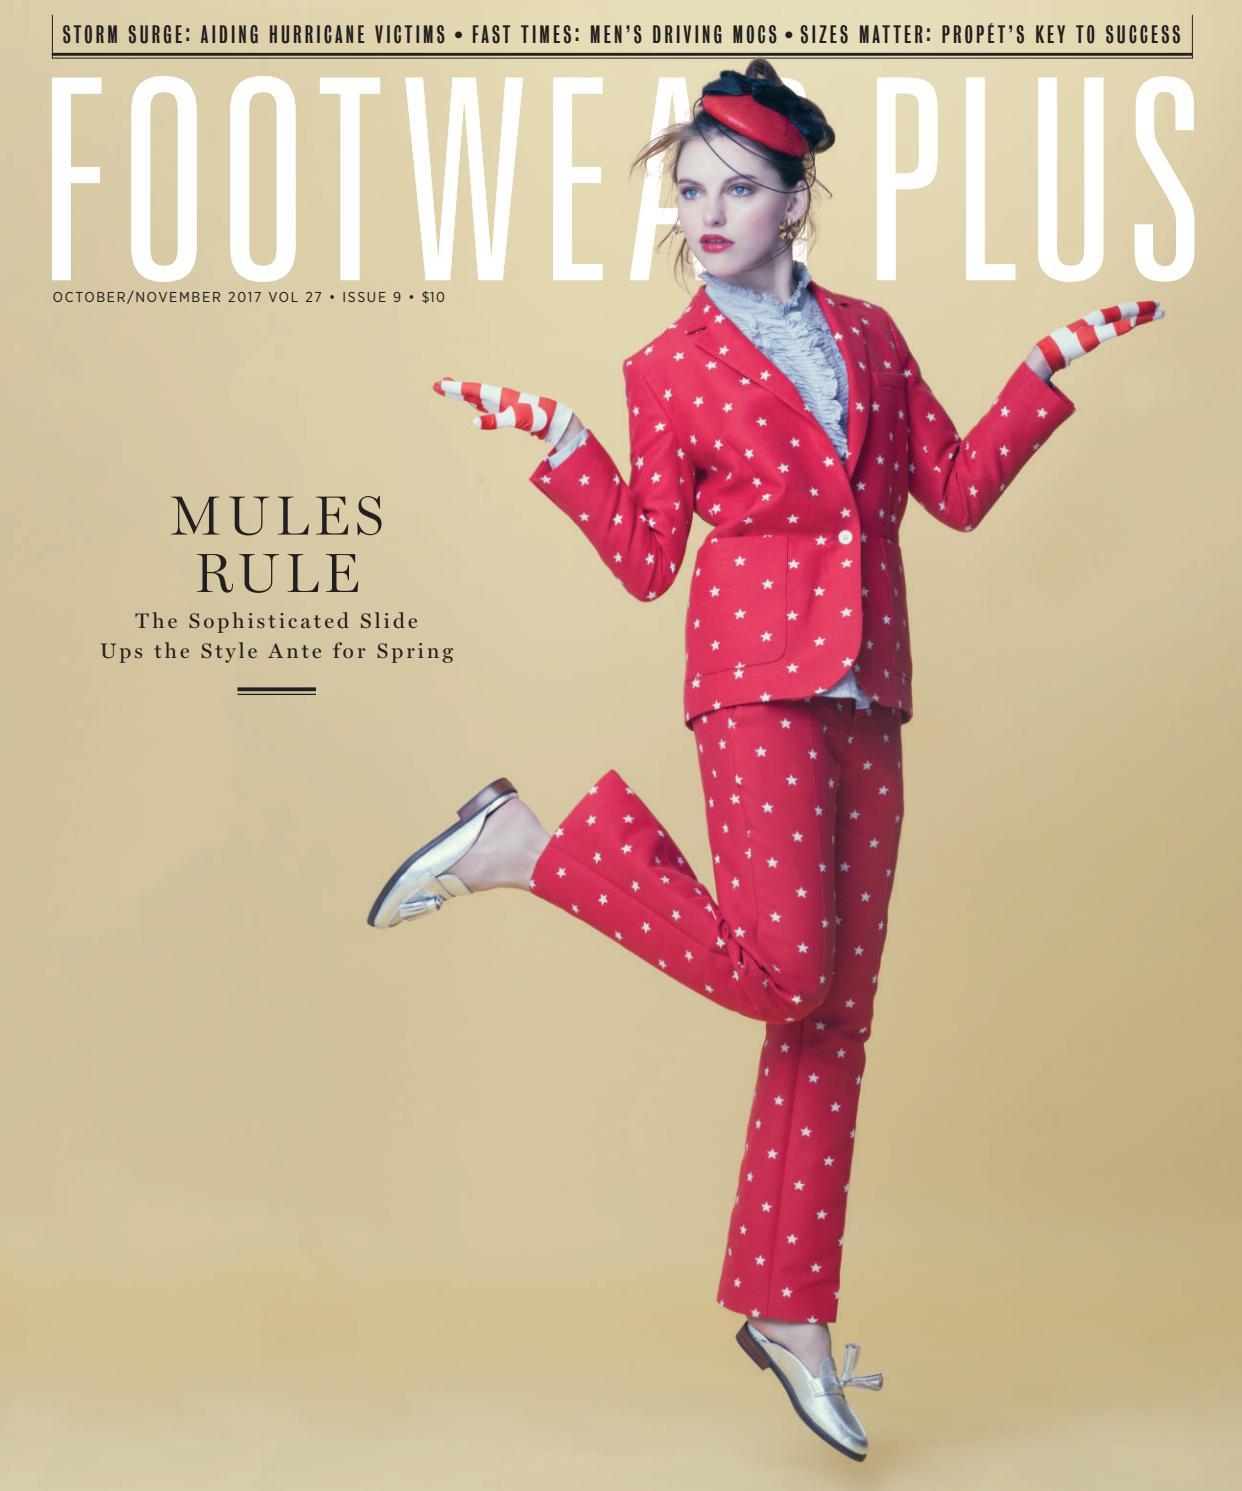 4813599de7000 Footwear Plus | October/November 2017 by 9Threads - issuu